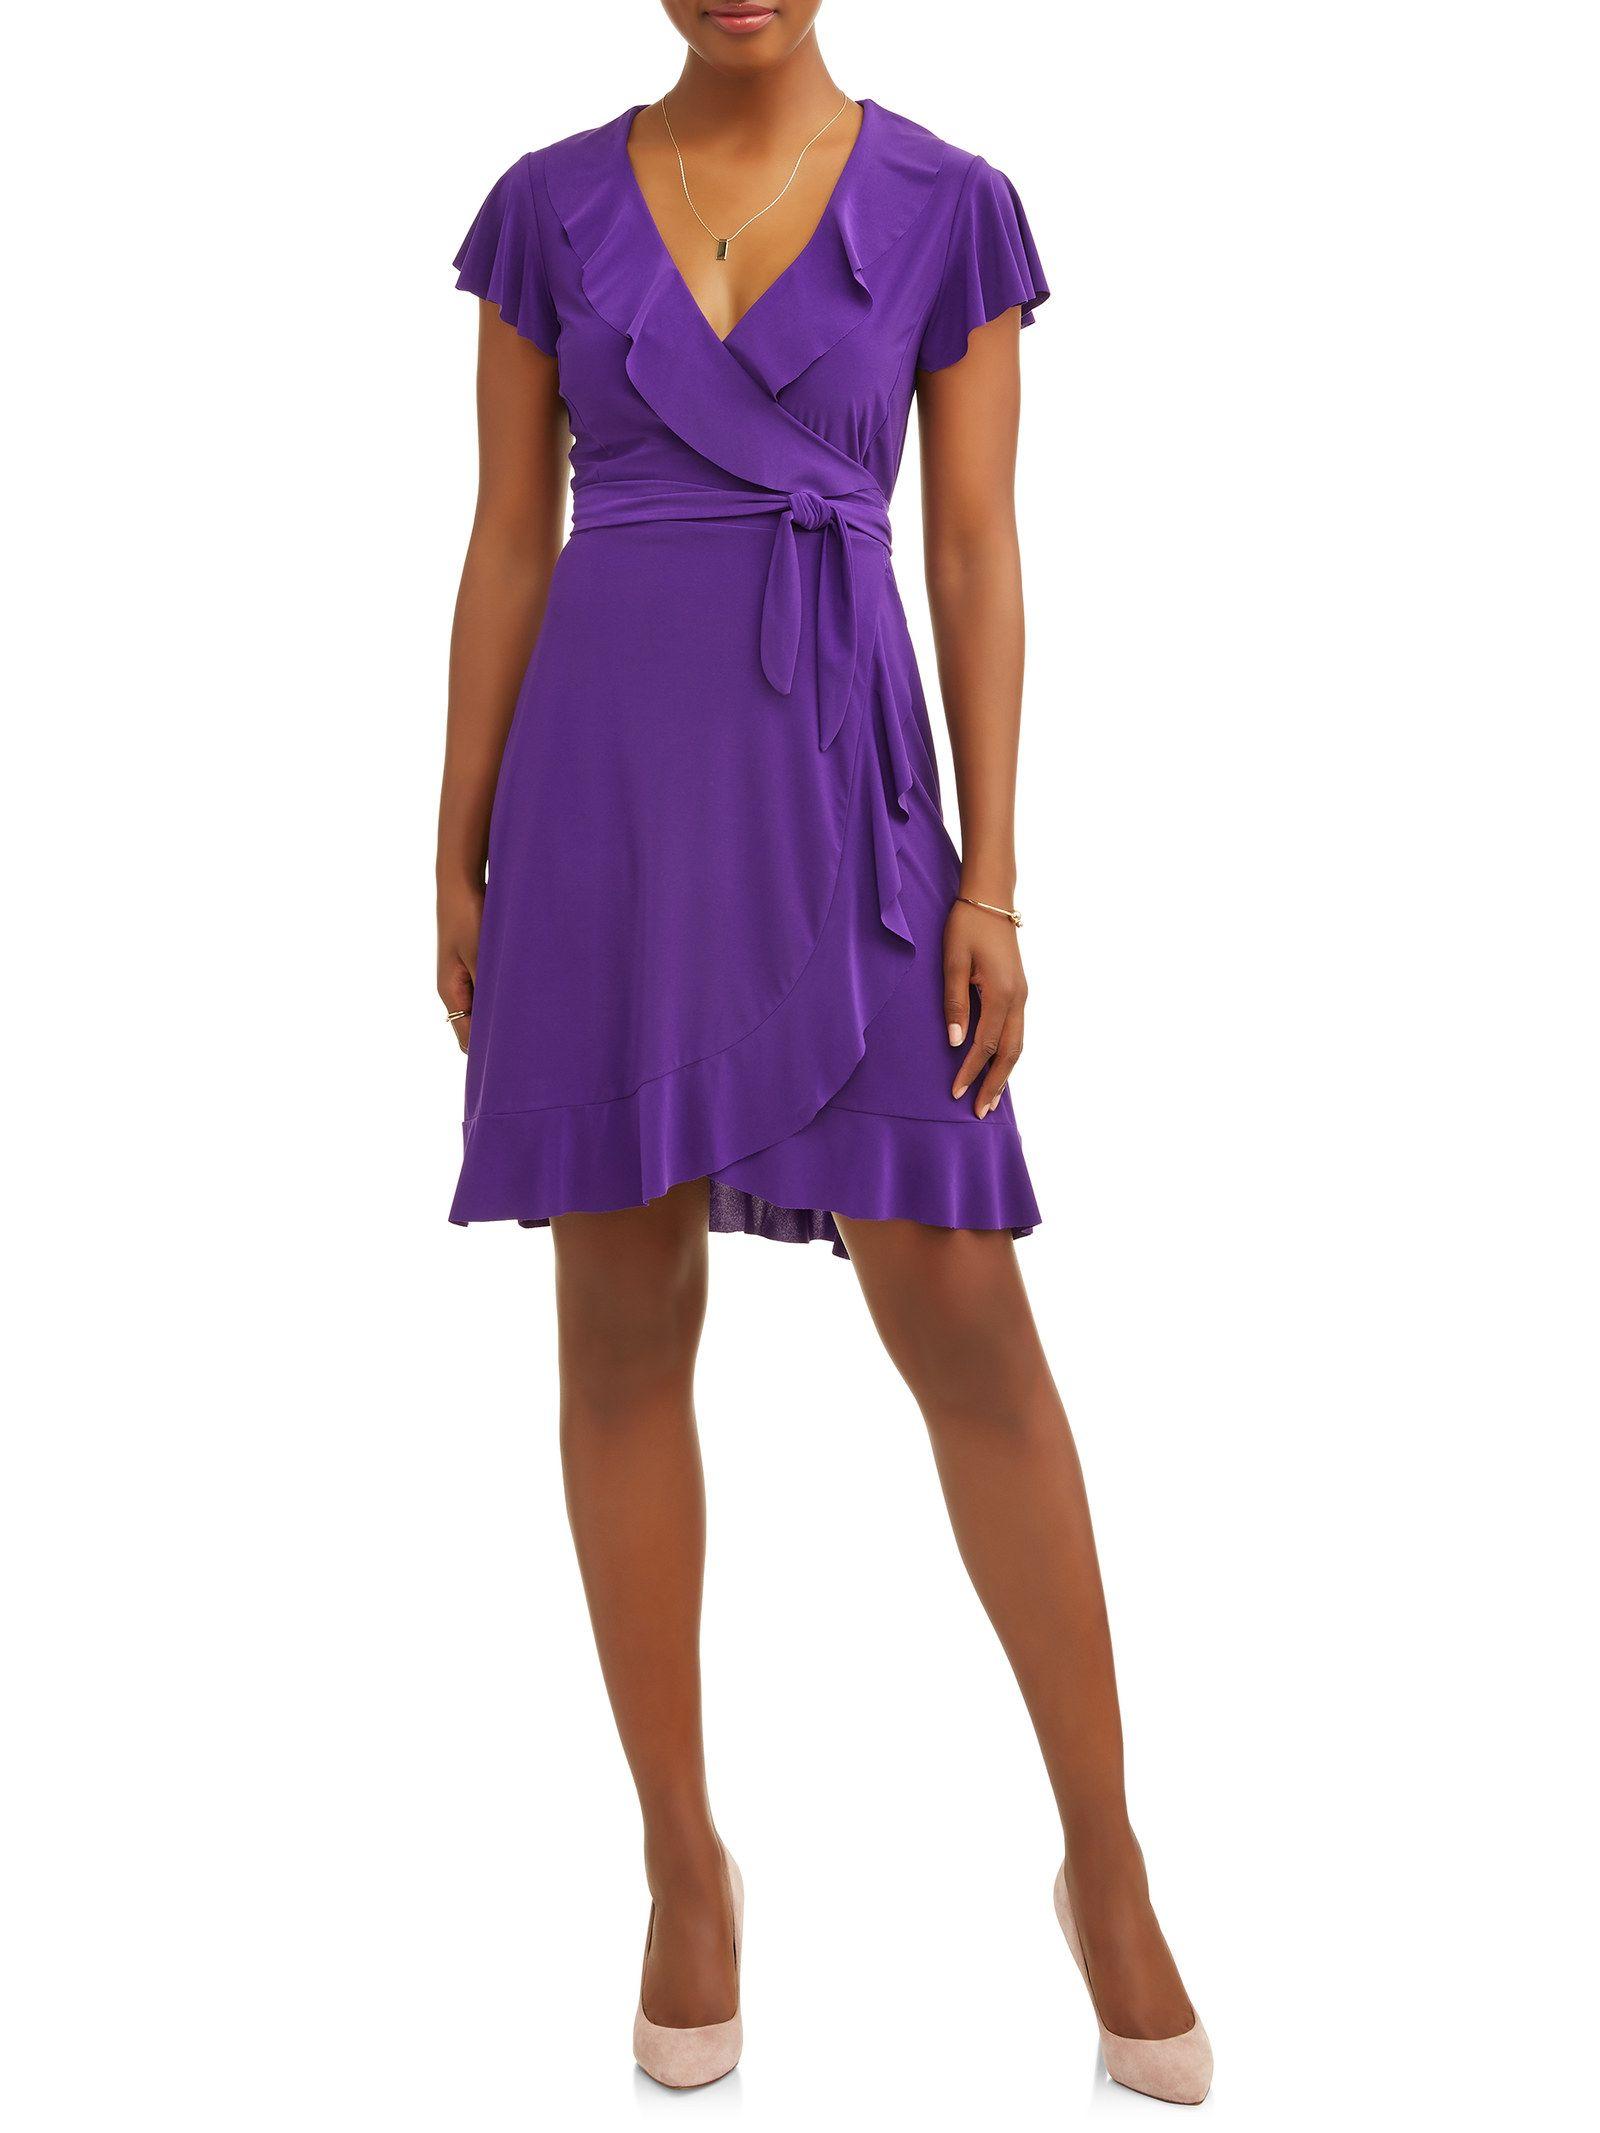 31 Stylish Things No One Will Believe You Got From Walmart Wrap Dress Ruffle Wrap Dress Casual Wrap Dress [ 2133 x 1600 Pixel ]